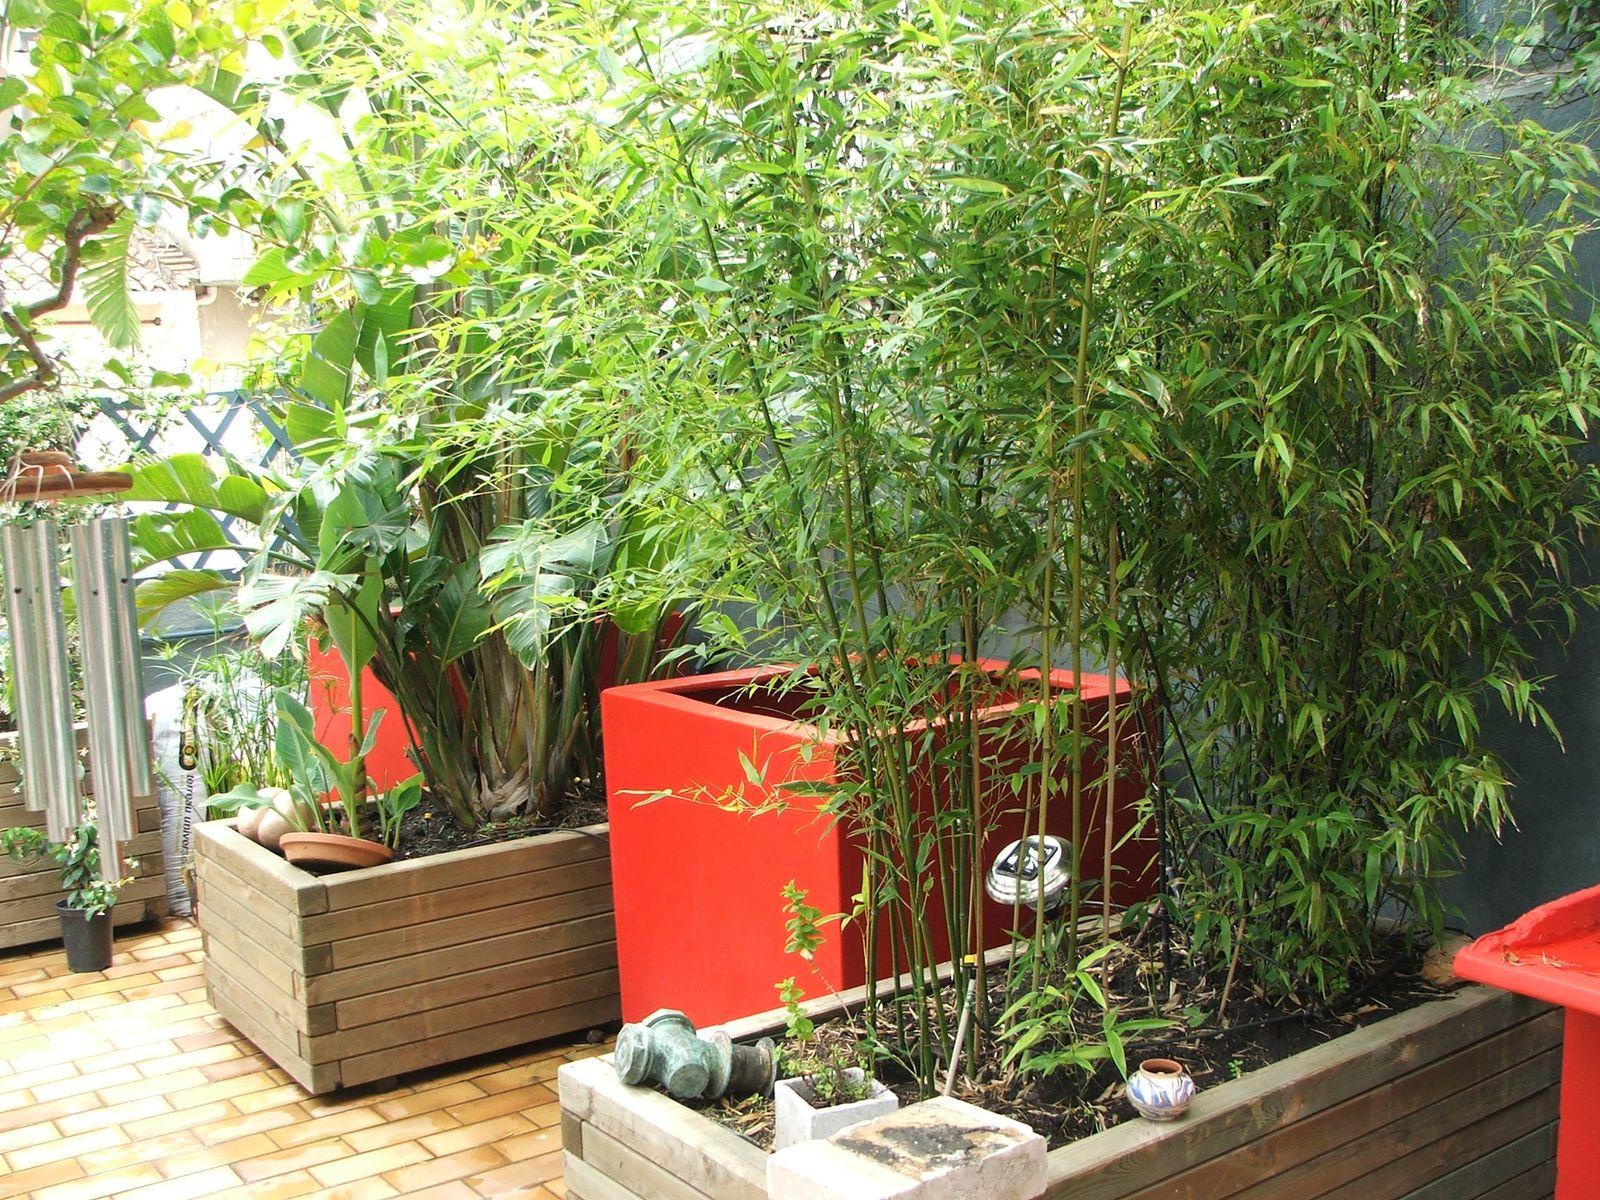 Ces jardins de ville agence arcambal concepteur paysagiste for Jardin 8686